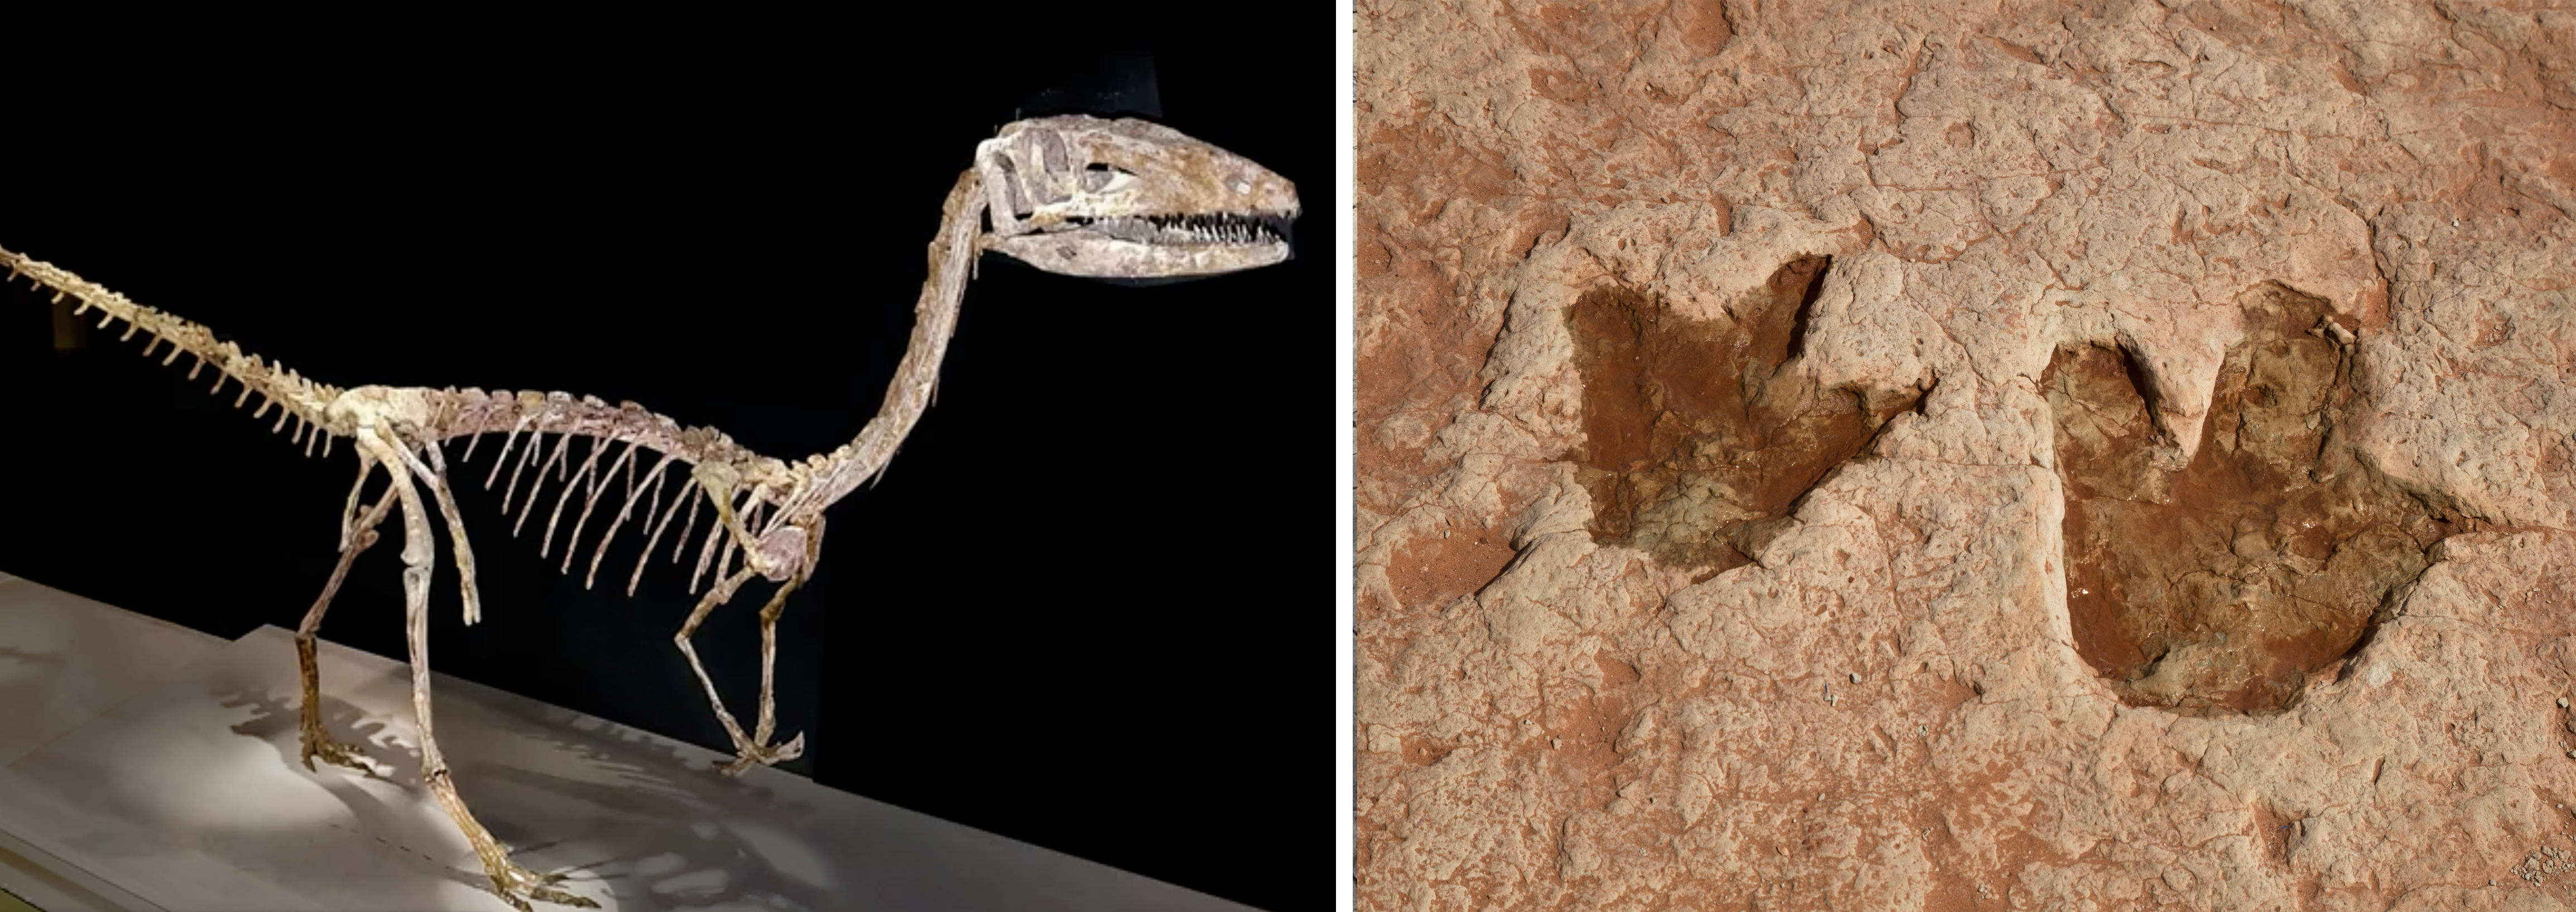 Dinosaur-Skeleton-and-Fossil-Footprints